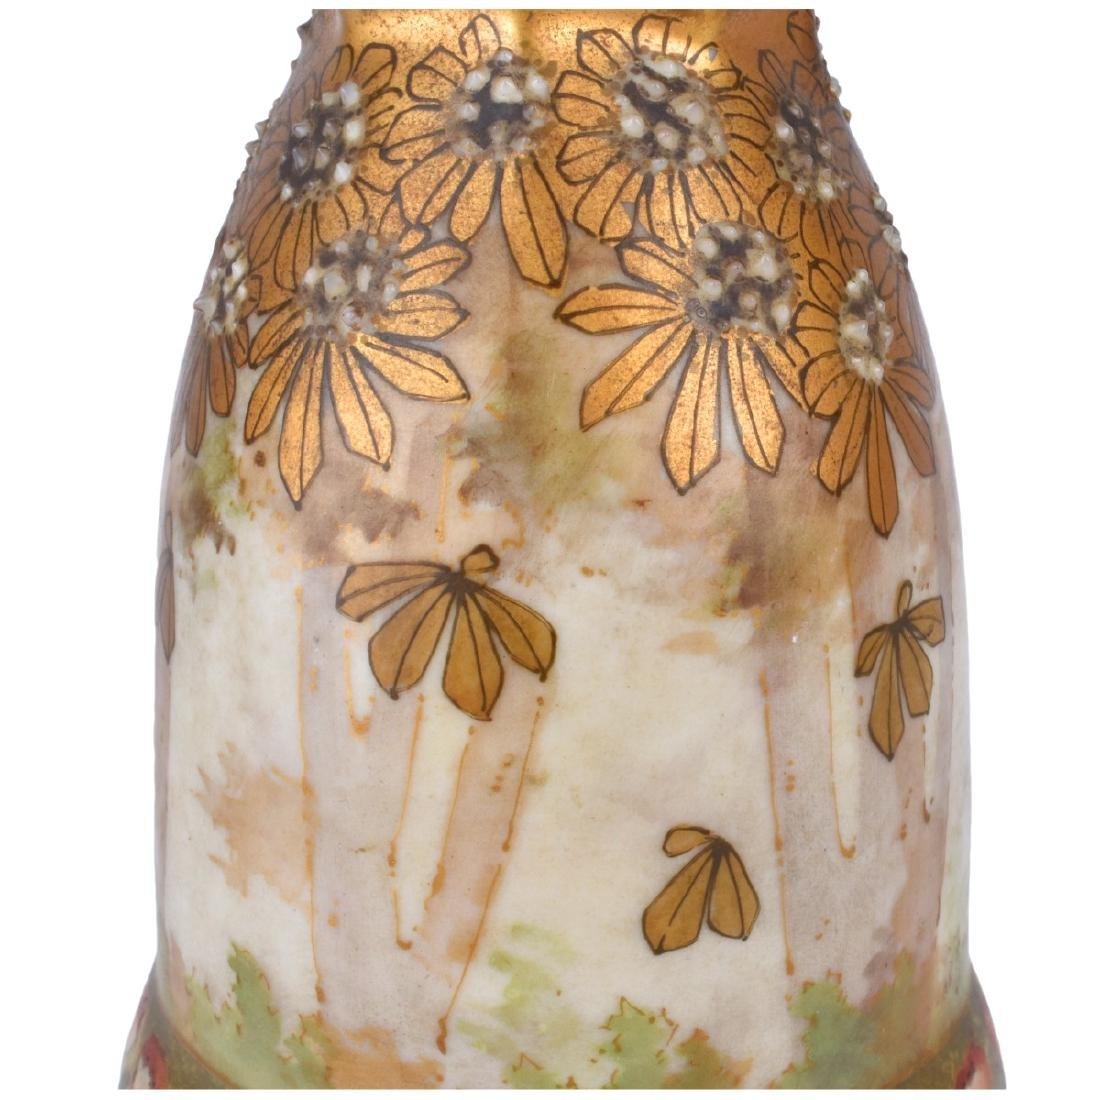 Turn Teplitz Amphora Vase - 2